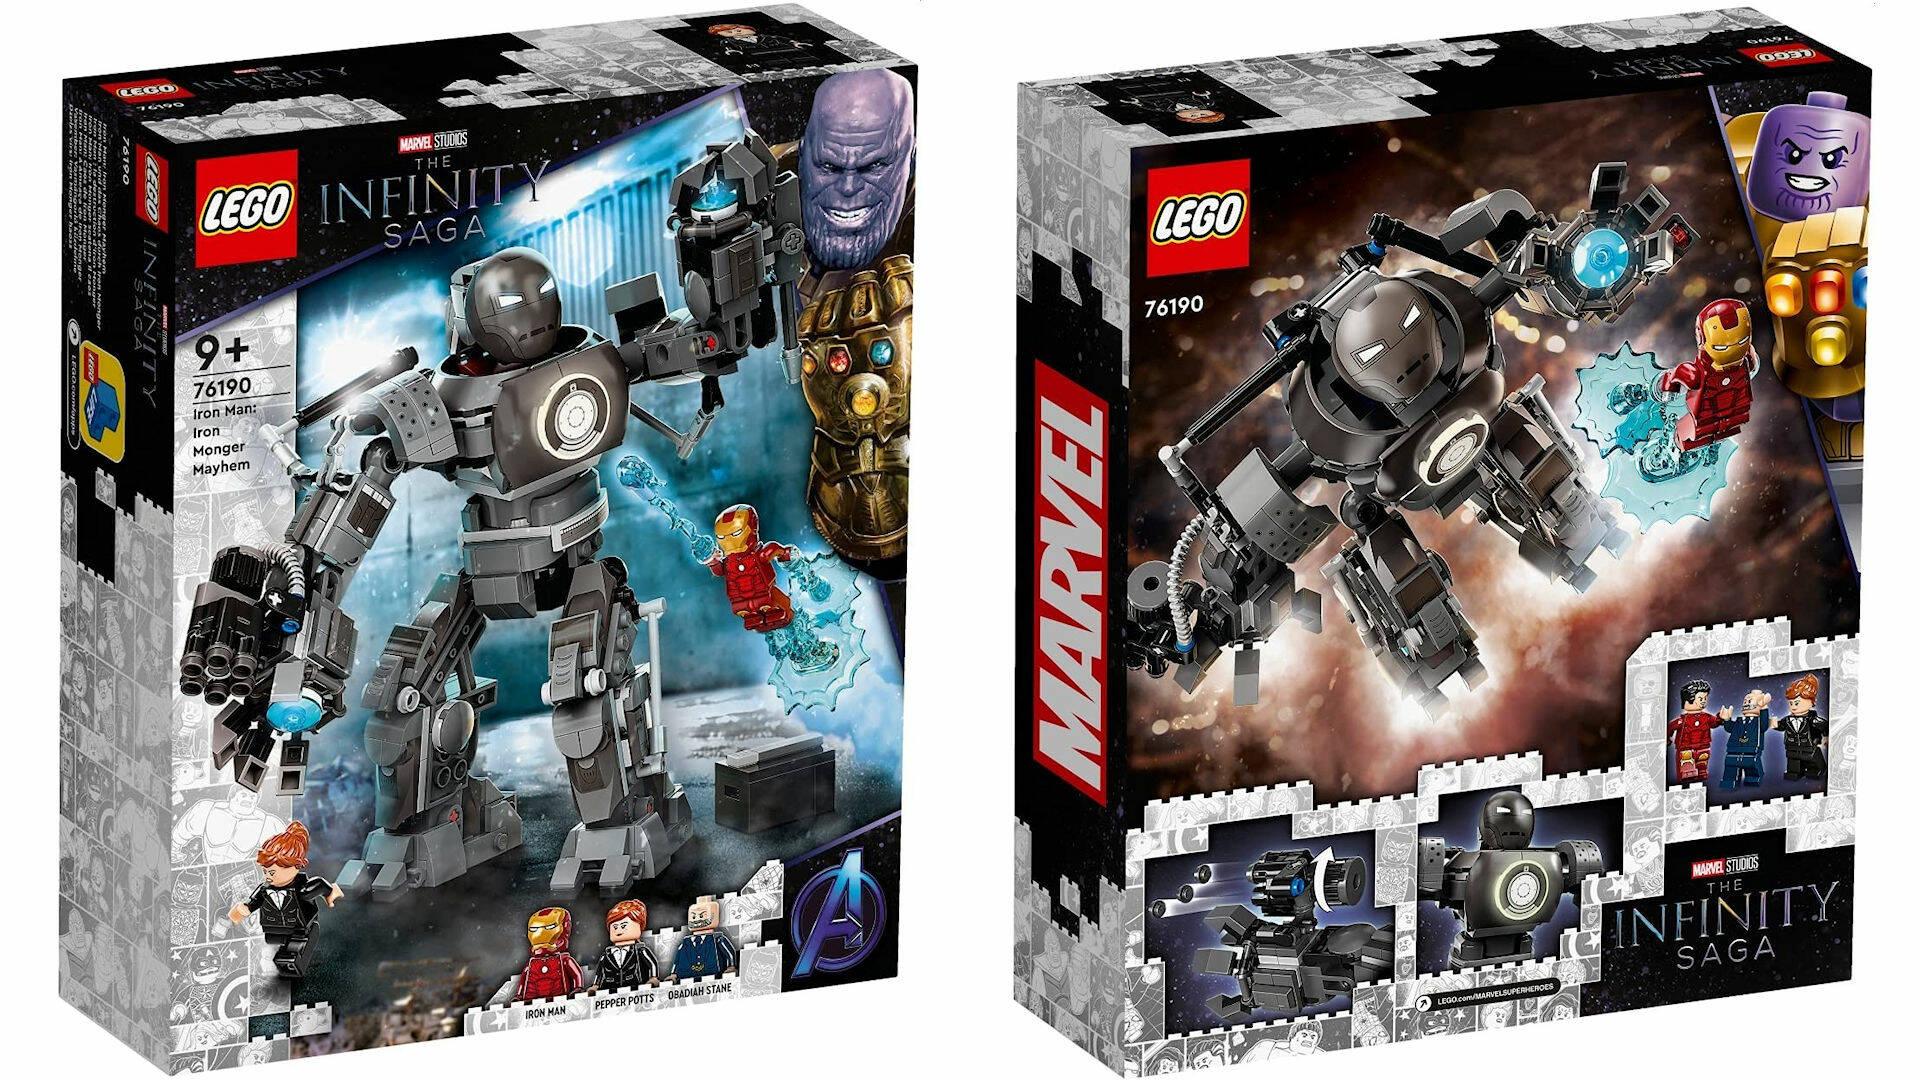 LEGO MARVEL INFINITY SAGA